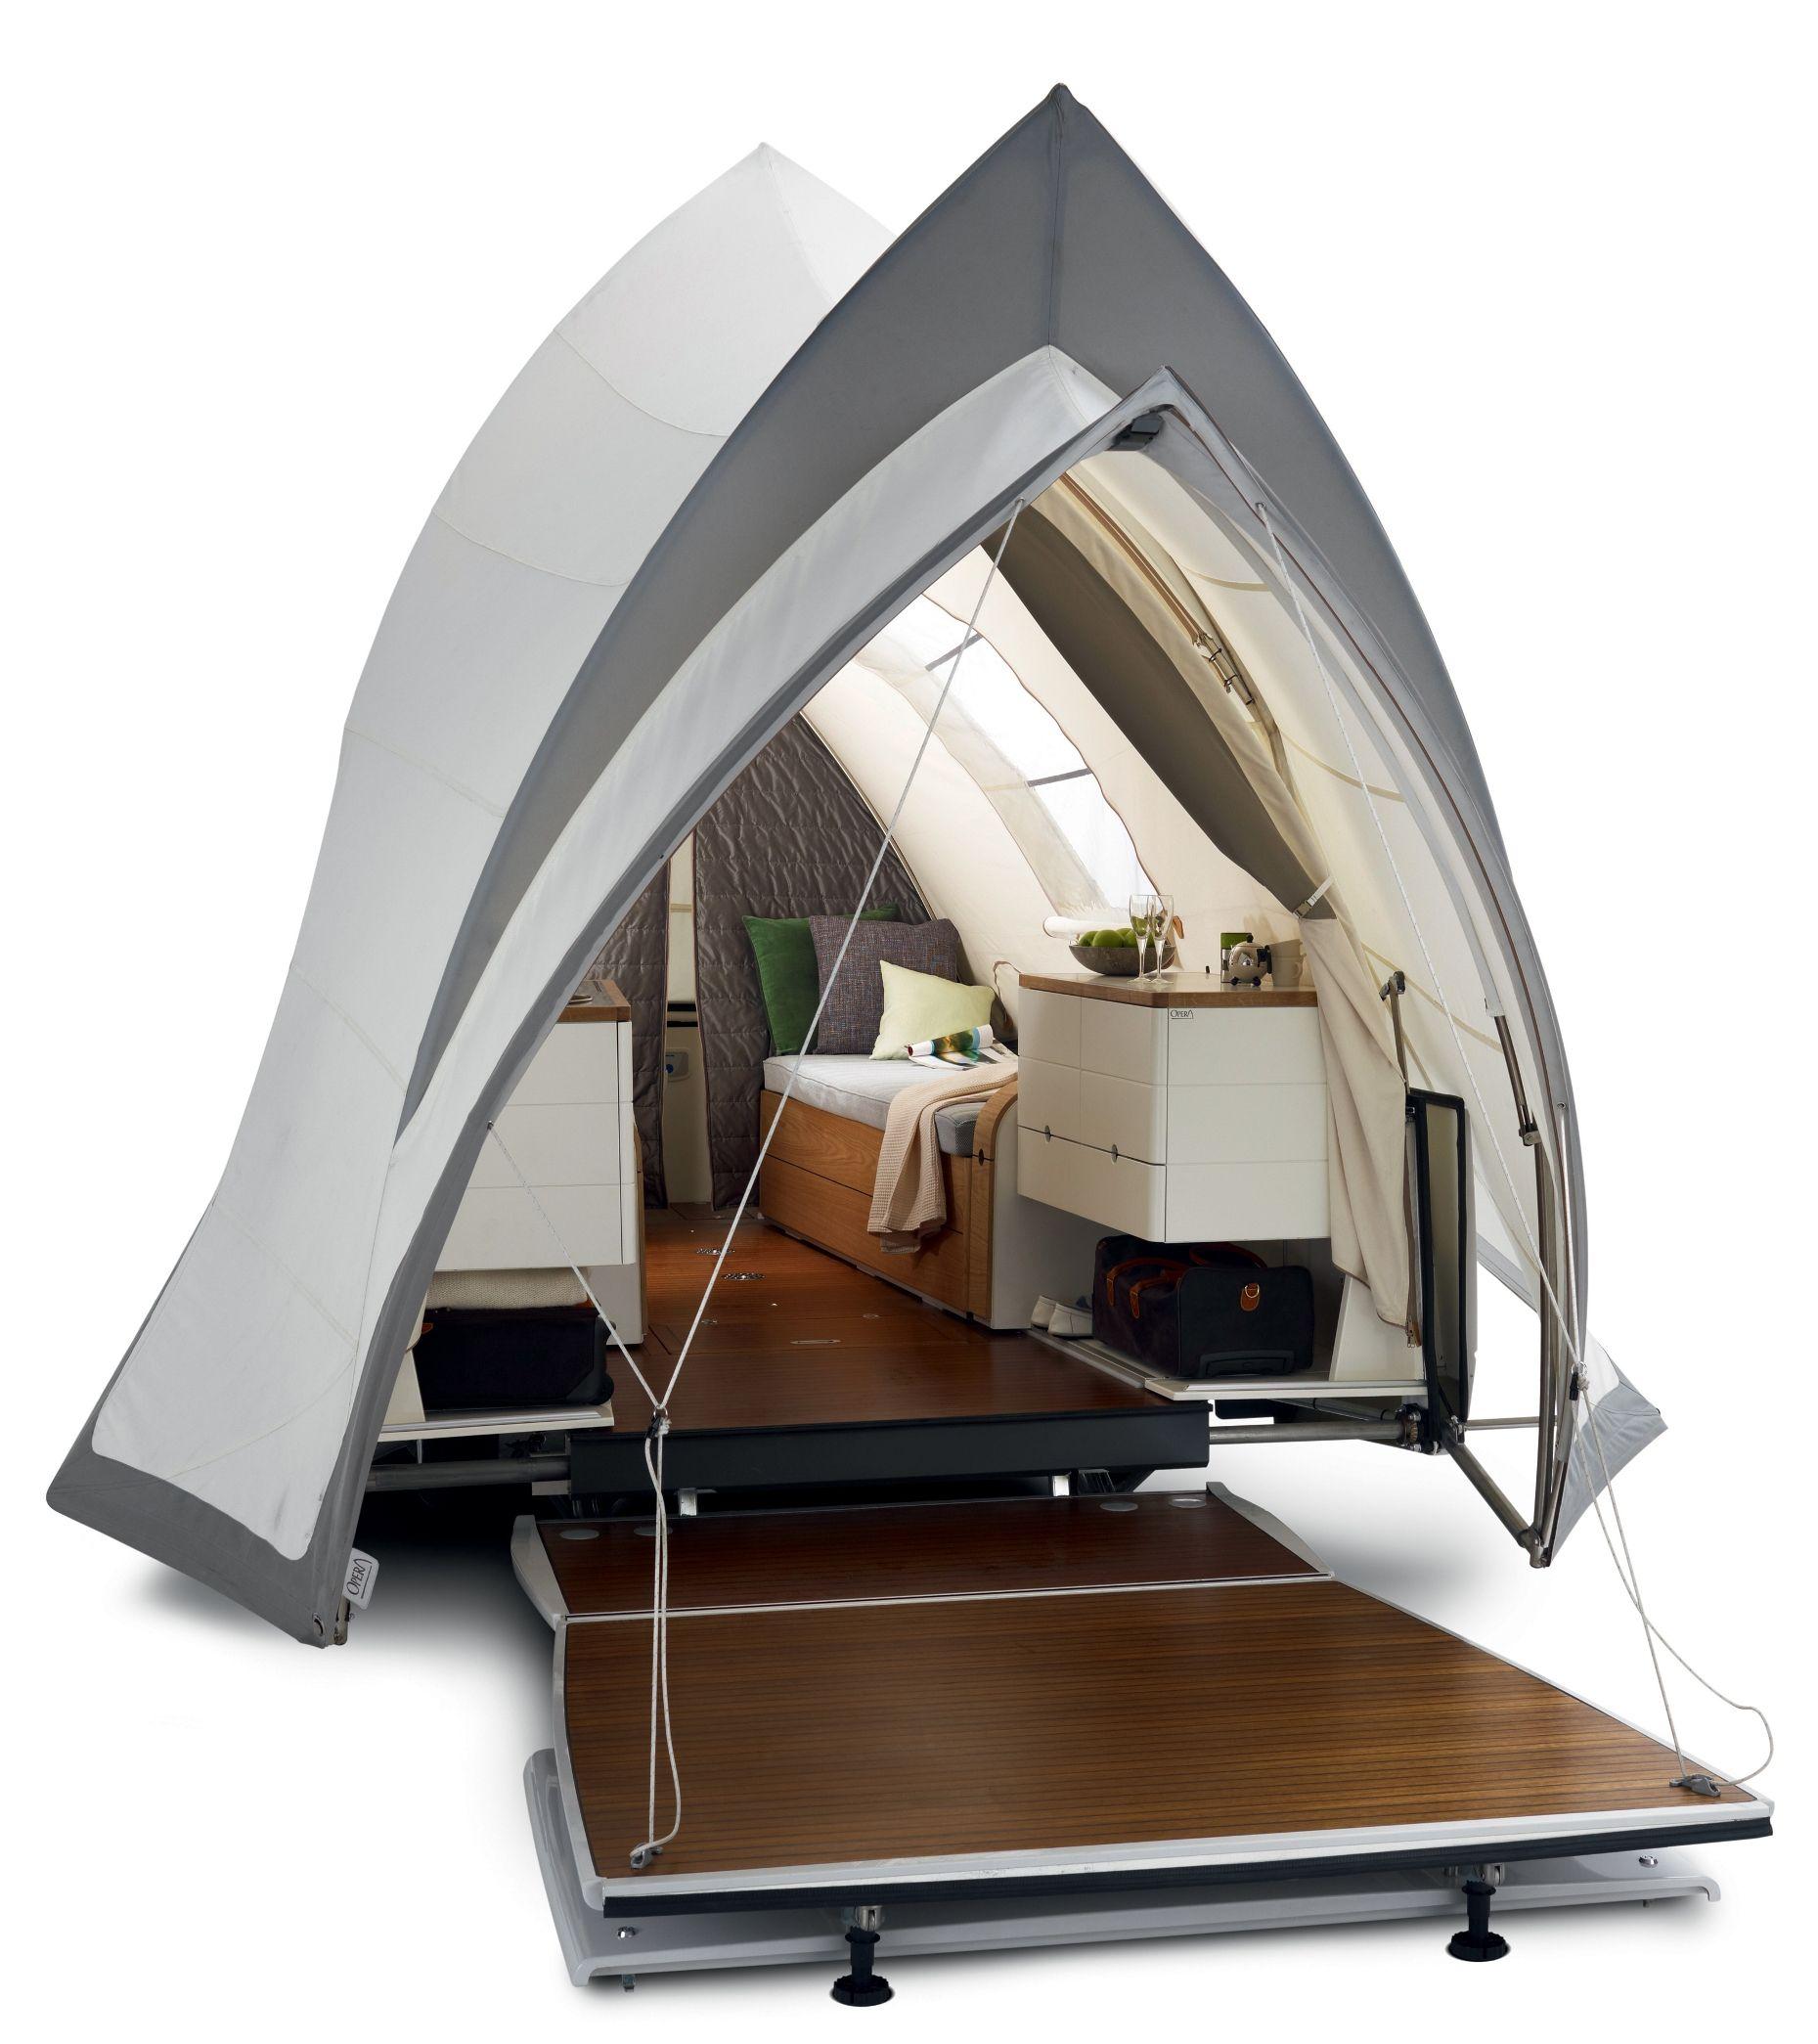 Opera Luxury Camping Trailer